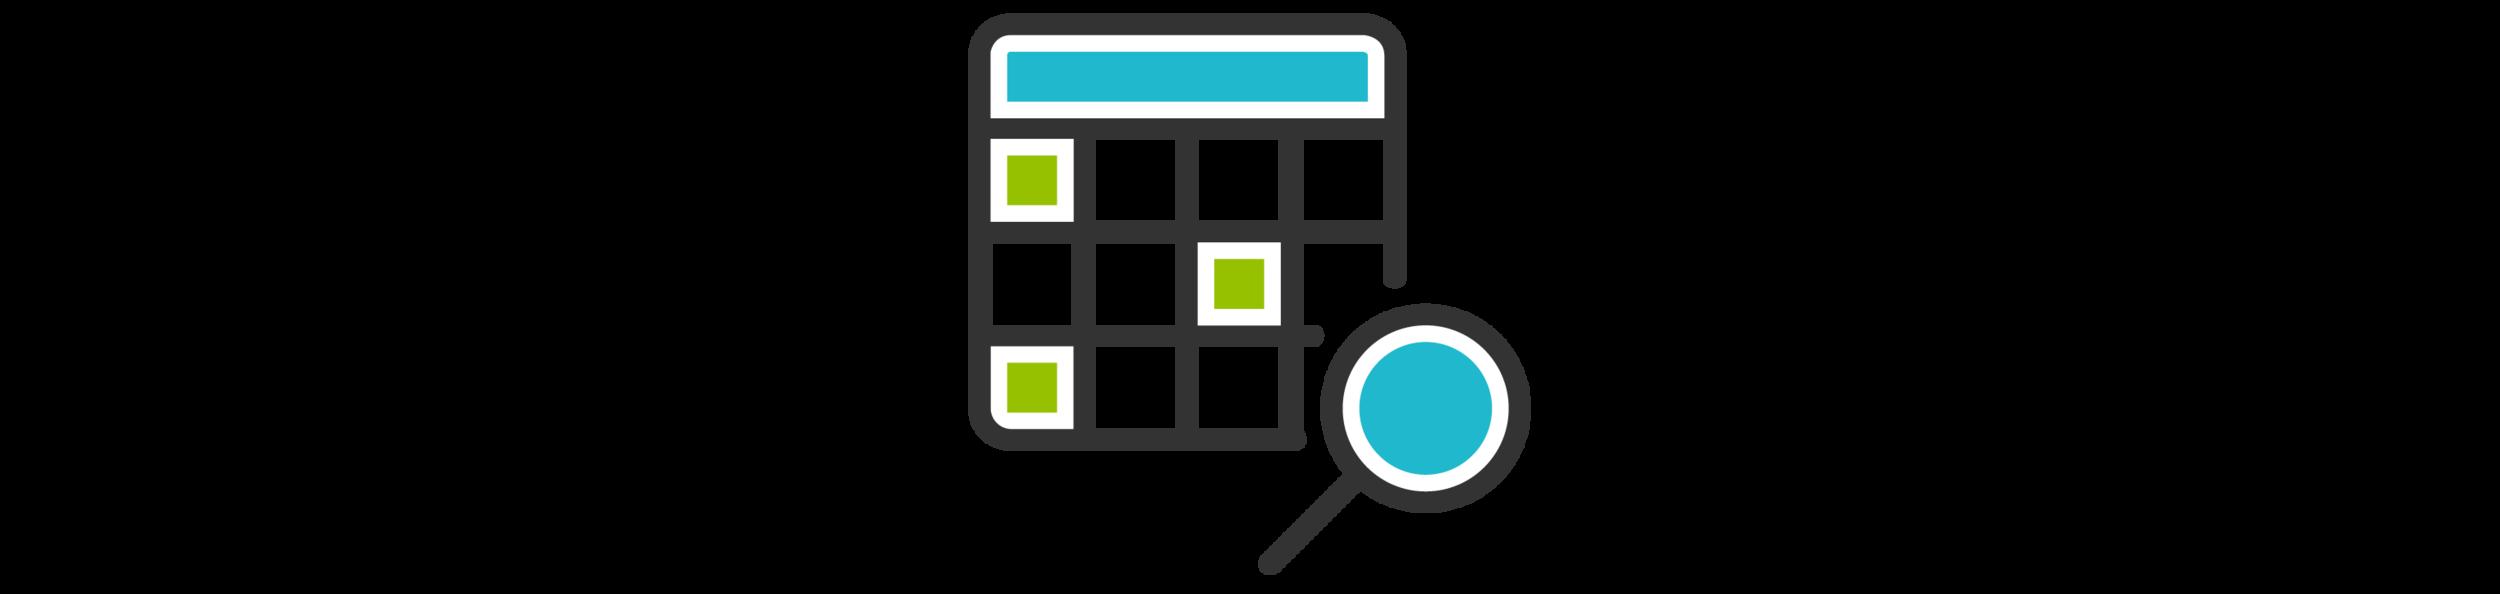 icon-Data_Analytics-multi.png